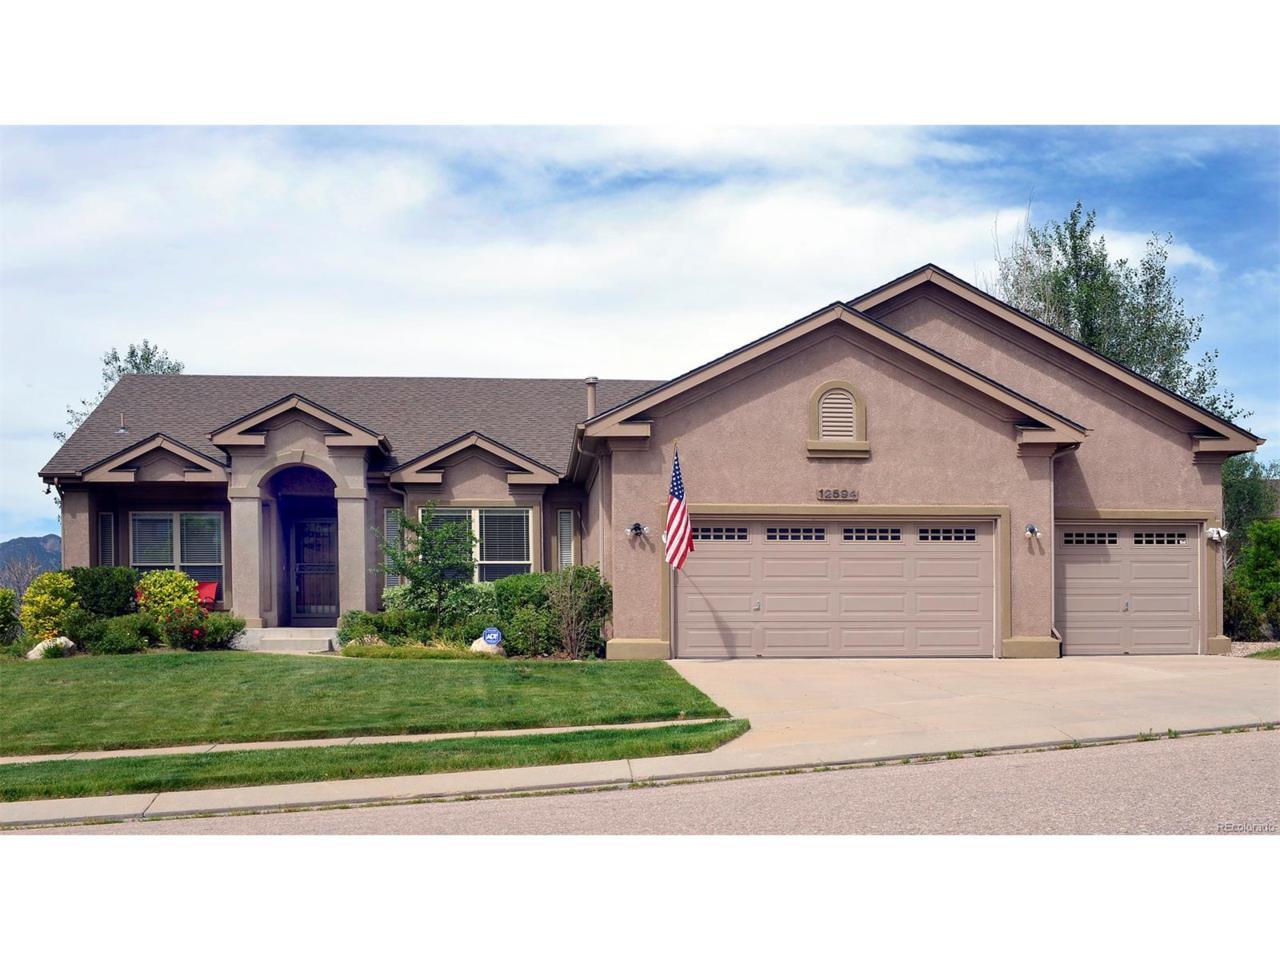 12594 Woodmont Drive, Colorado Springs, CO 80921 (MLS #5106202) :: 8z Real Estate